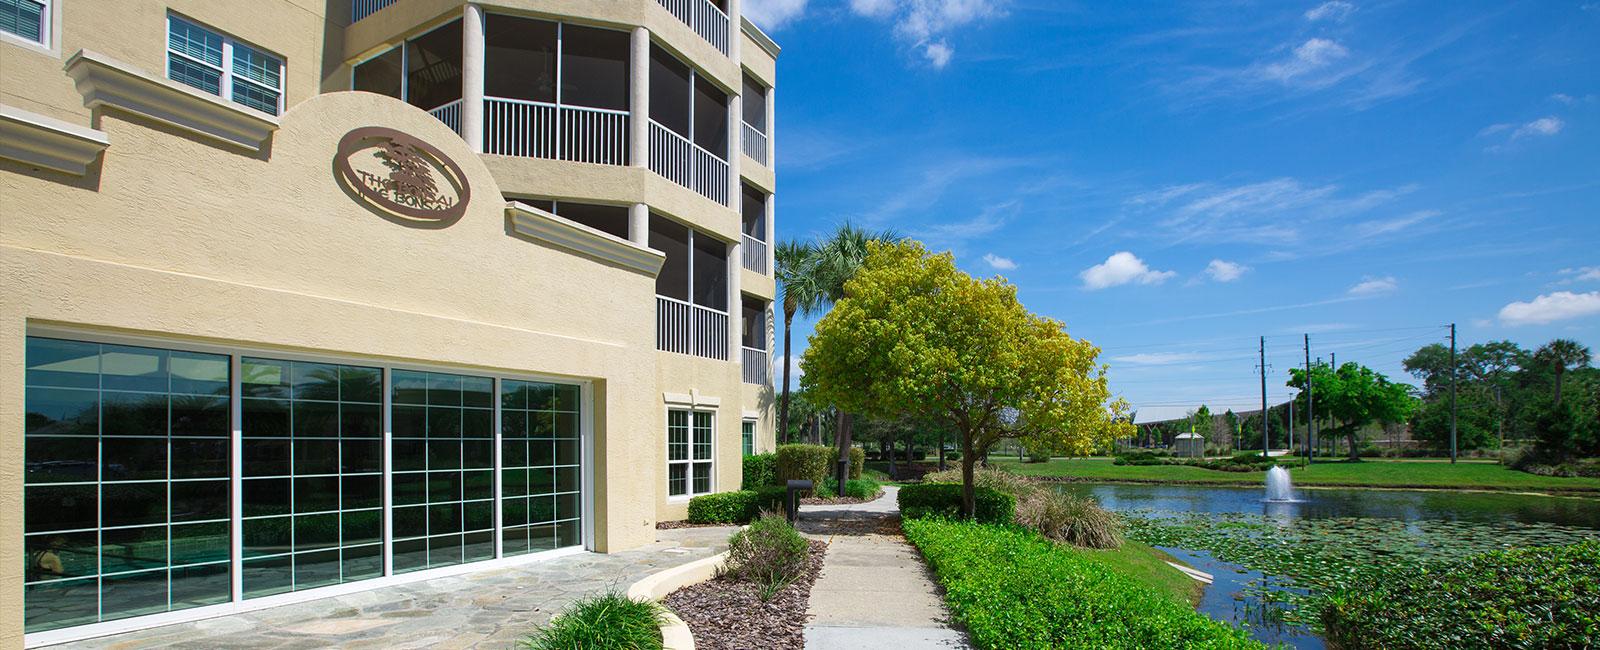 Cypress Palms | Senior Living Community | Largo, Florida